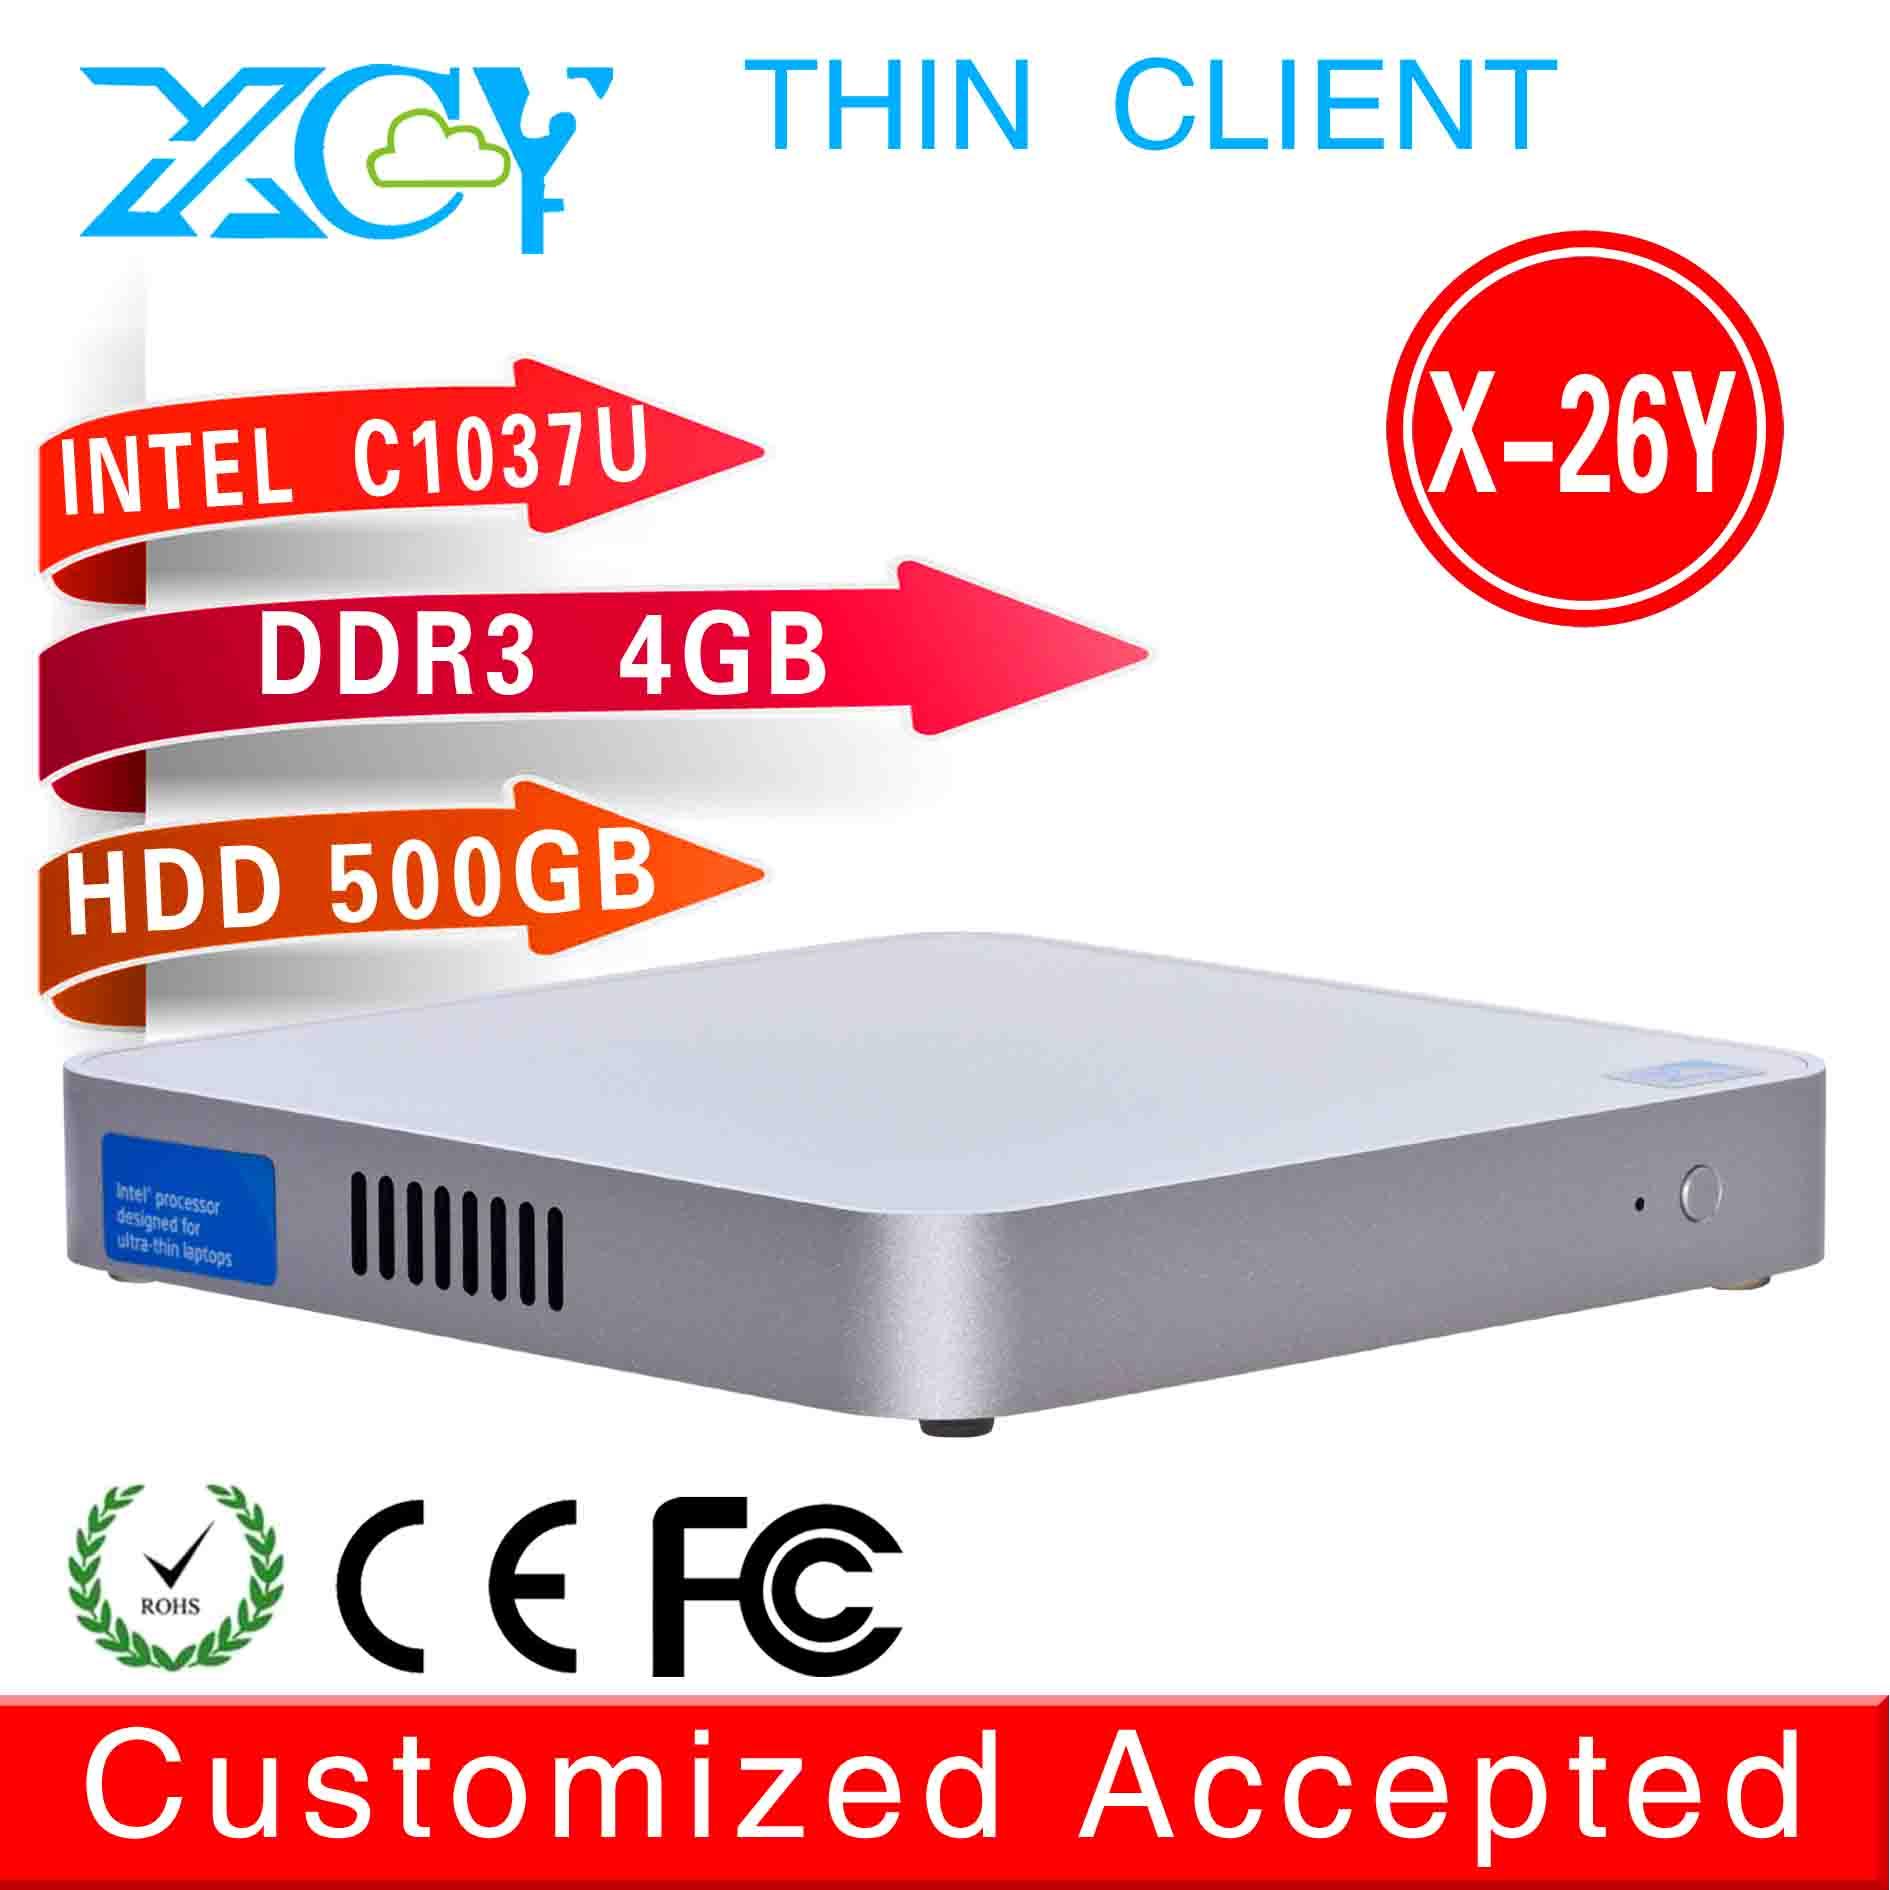 mini itx pc home server thin client X-26Y C1037U 4G RMA 500G HDD support Linux OS Ubuntu The cheapest(China (Mainland))